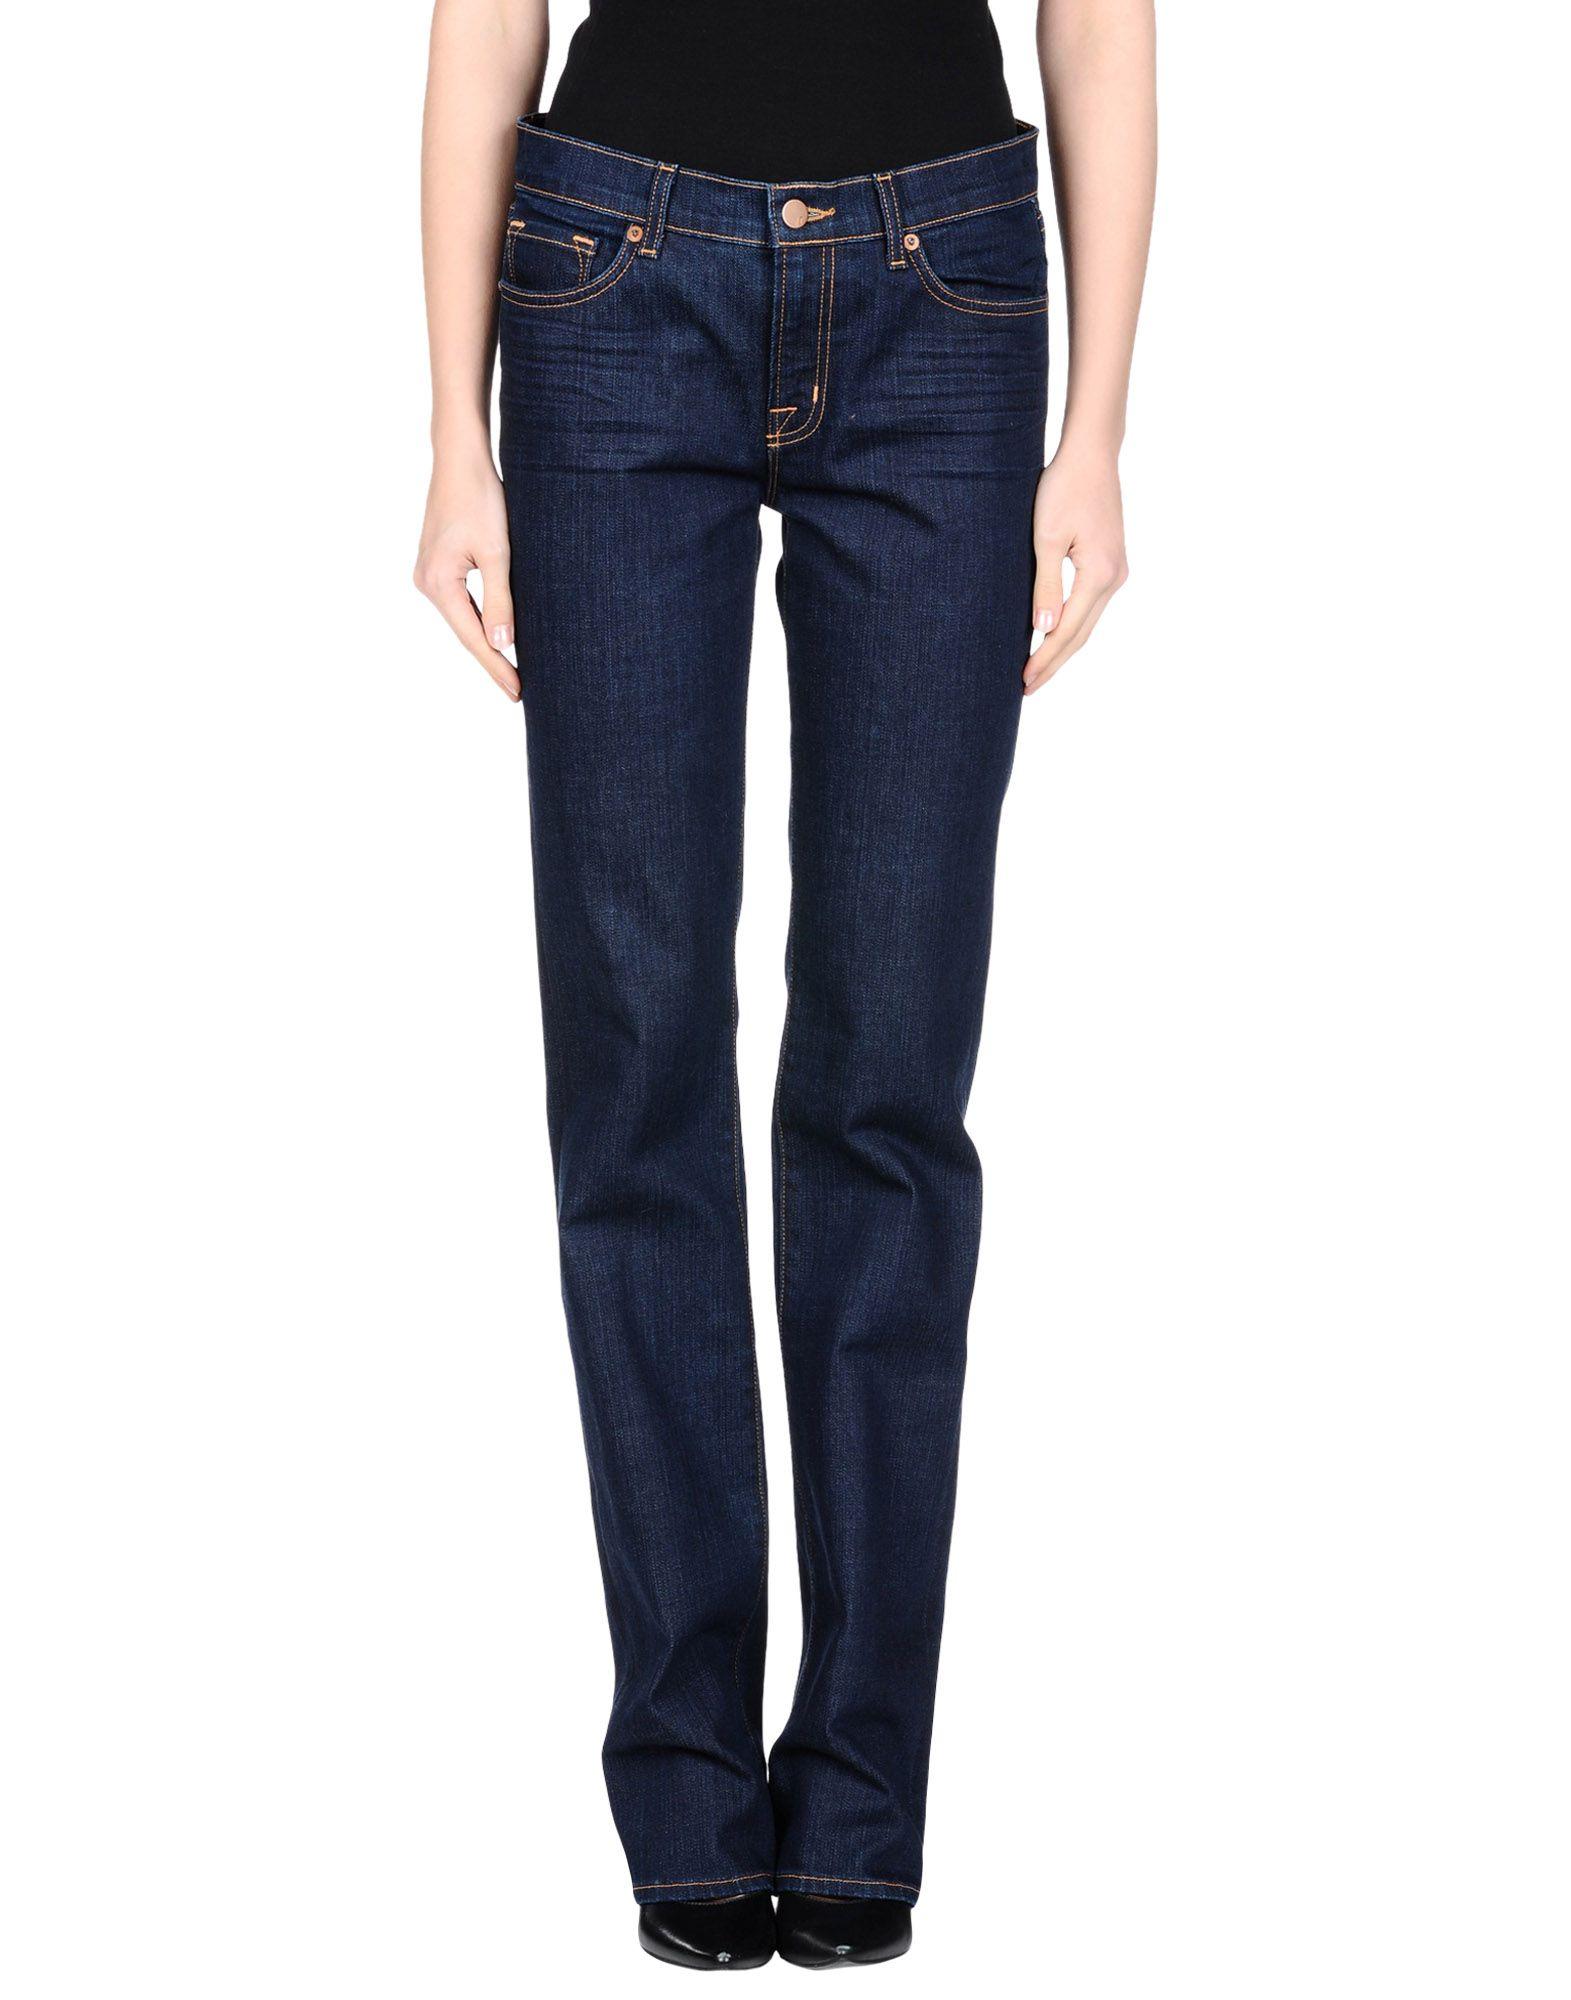 Pantaloni Jeans J Brand Donna - Acquista online su Gvg4rXzfVI